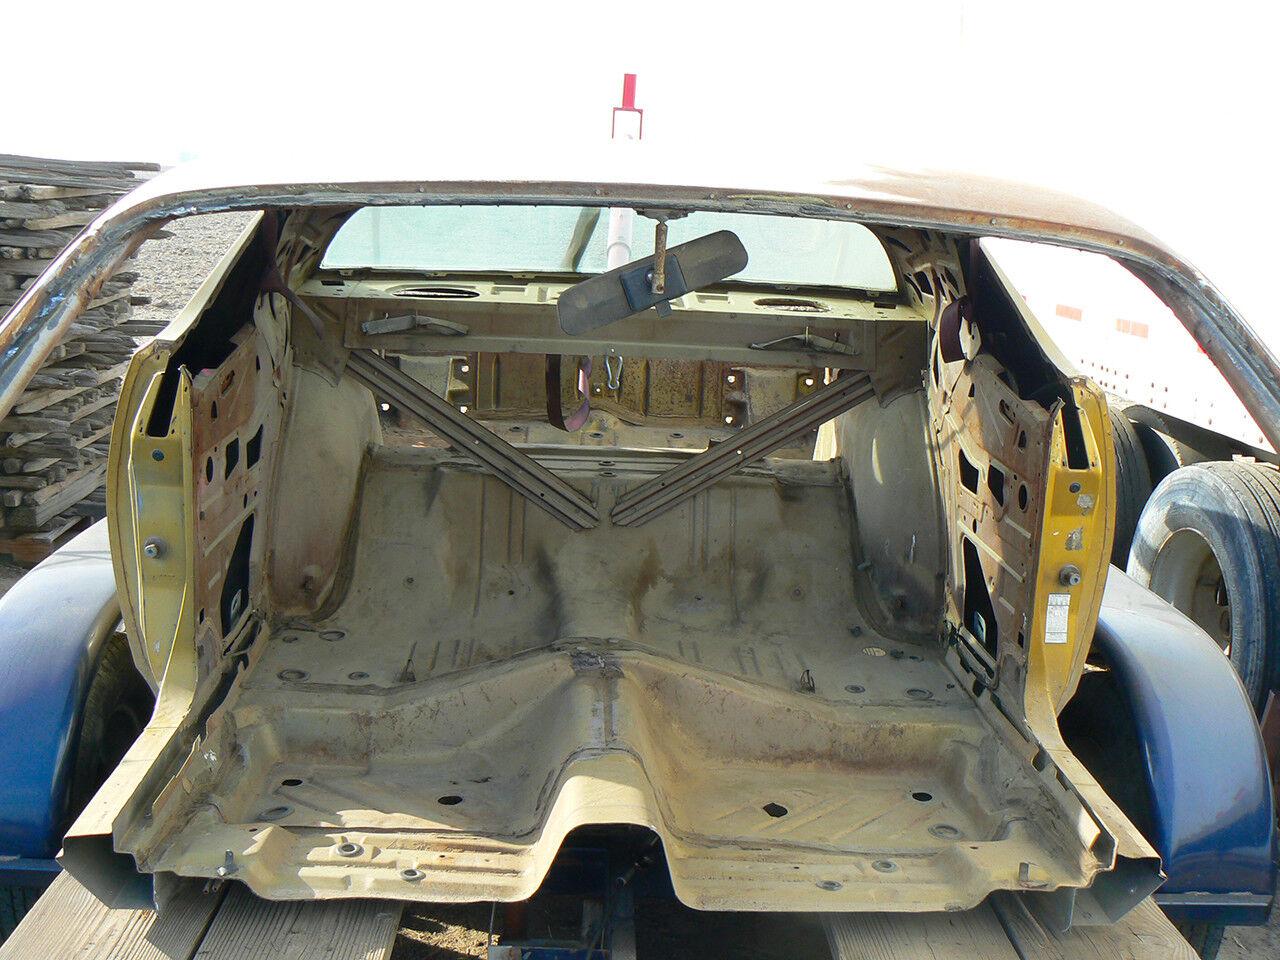 1972 Dodge Charger S/E Rallye Rust free Quarter panel Roof Floor back half mopar